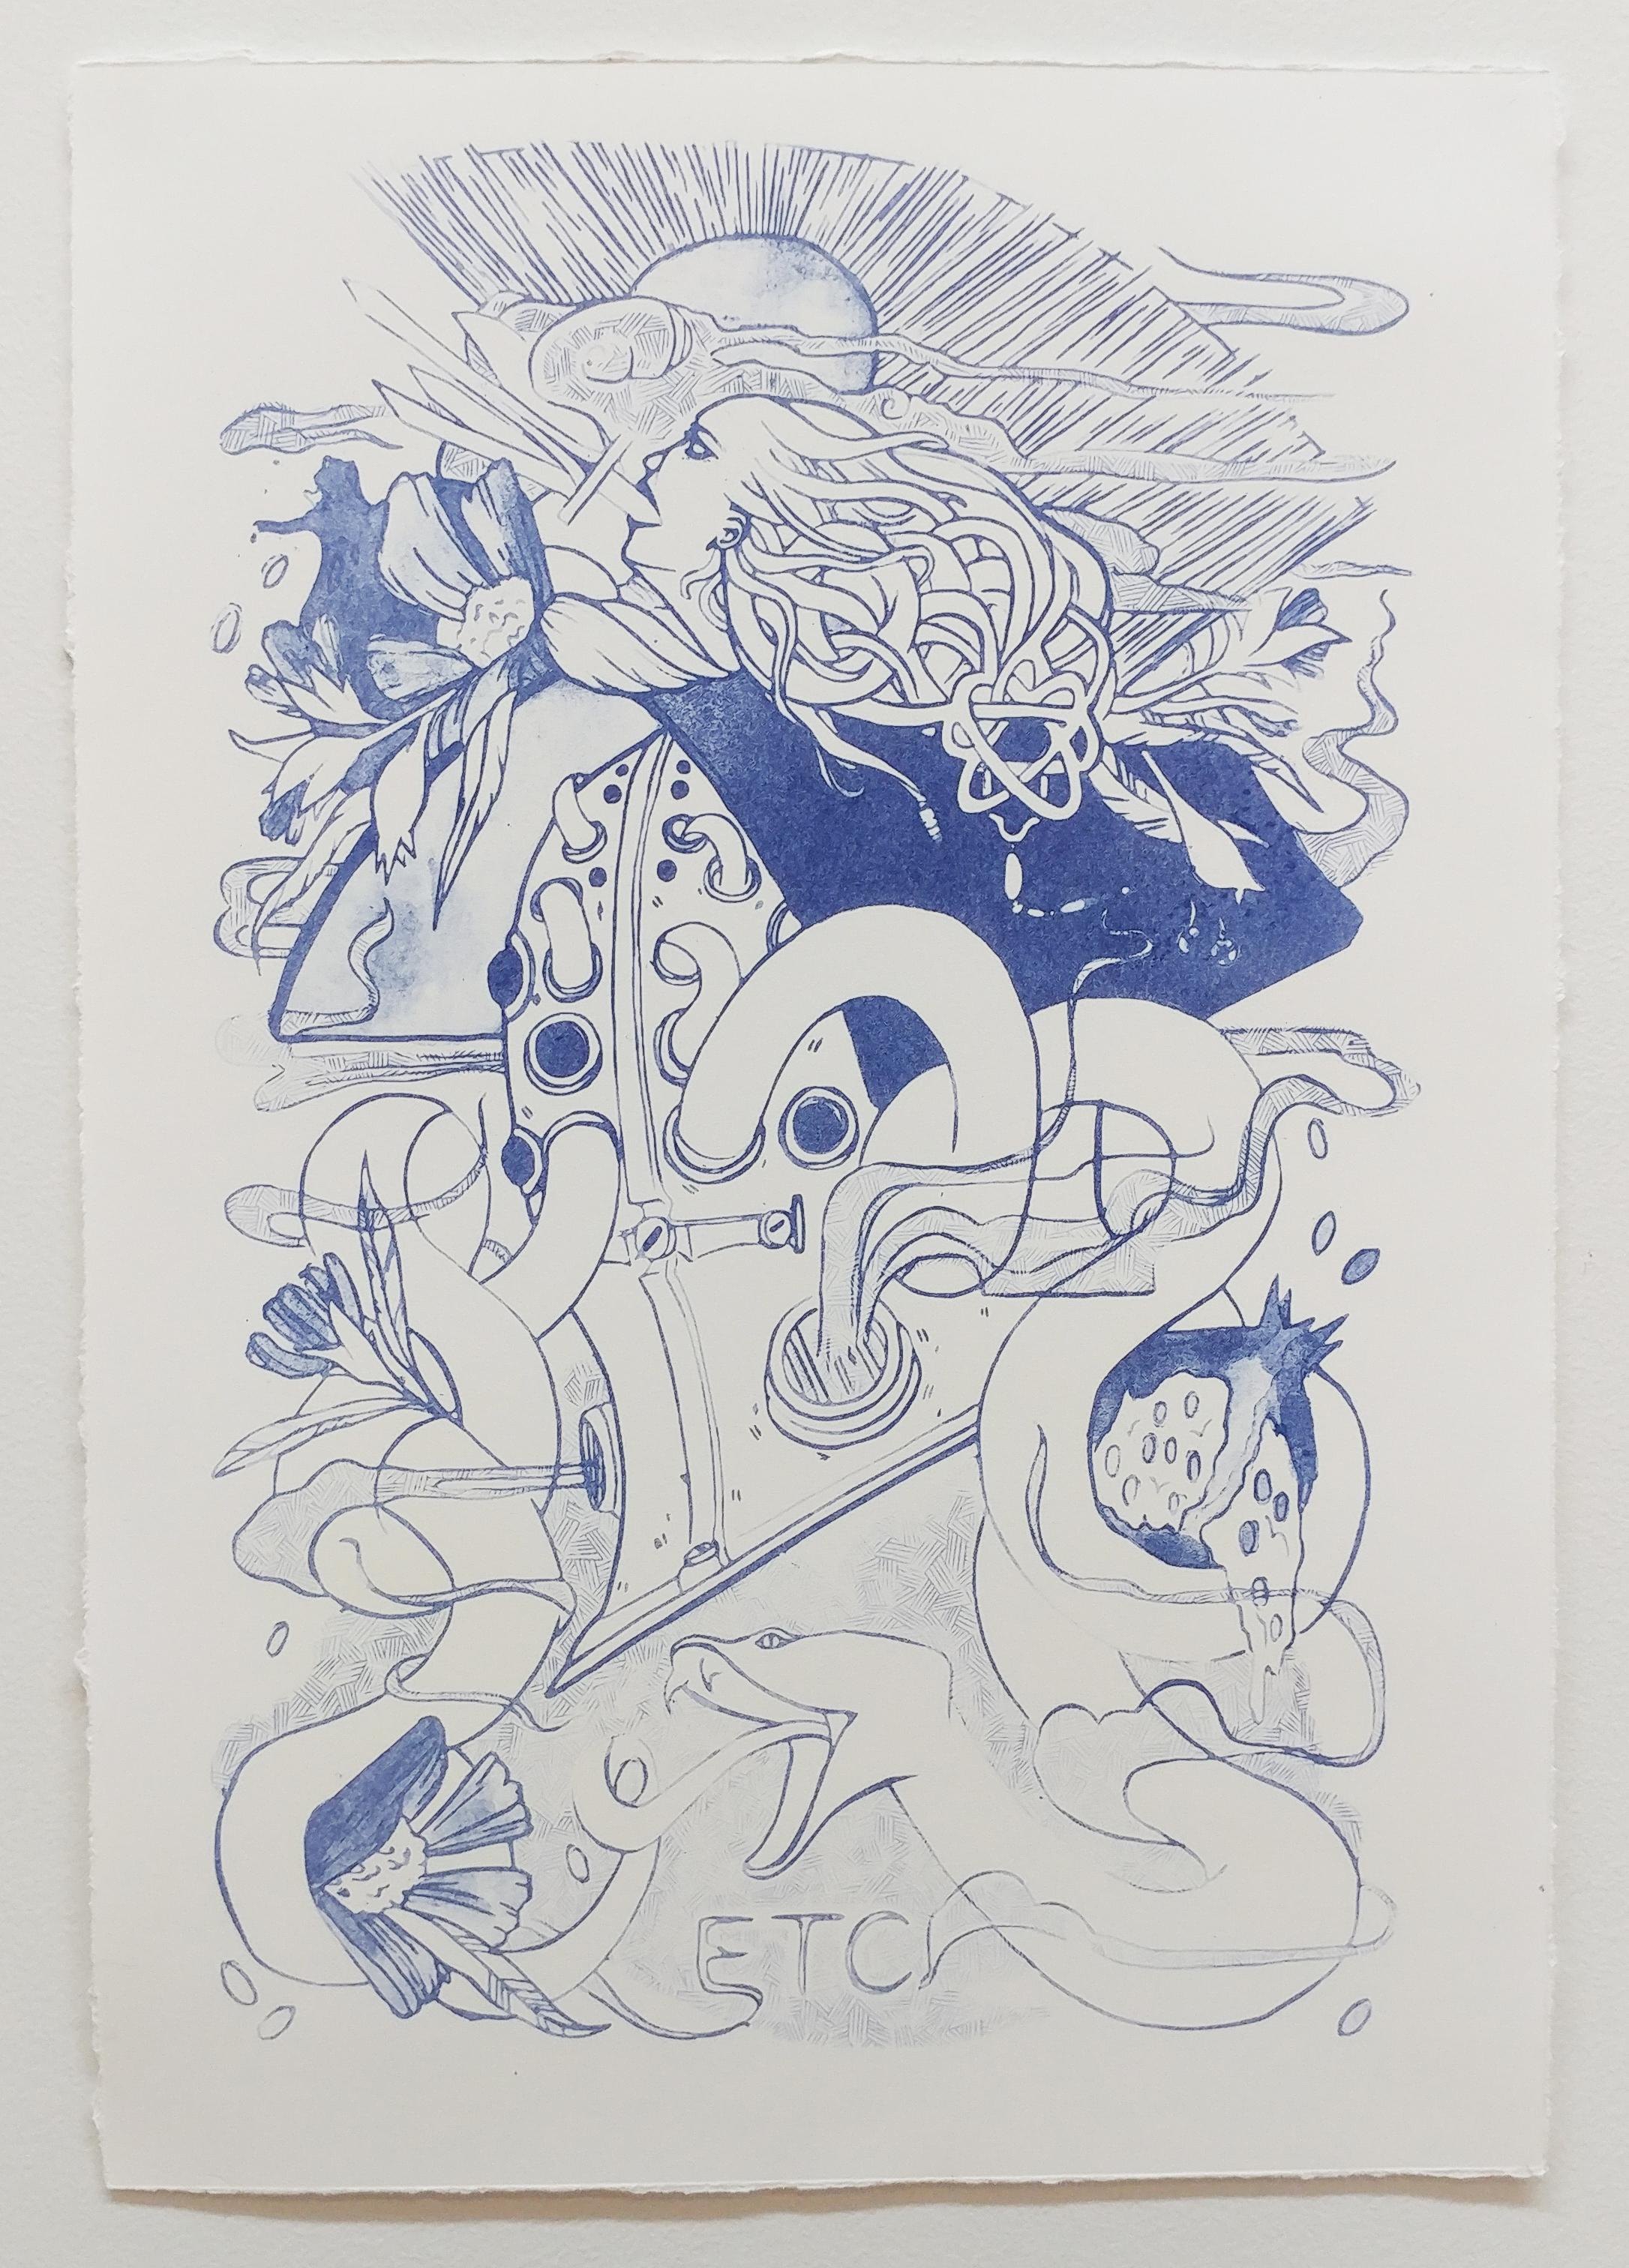 My Sigil - Plate Lithograph Print